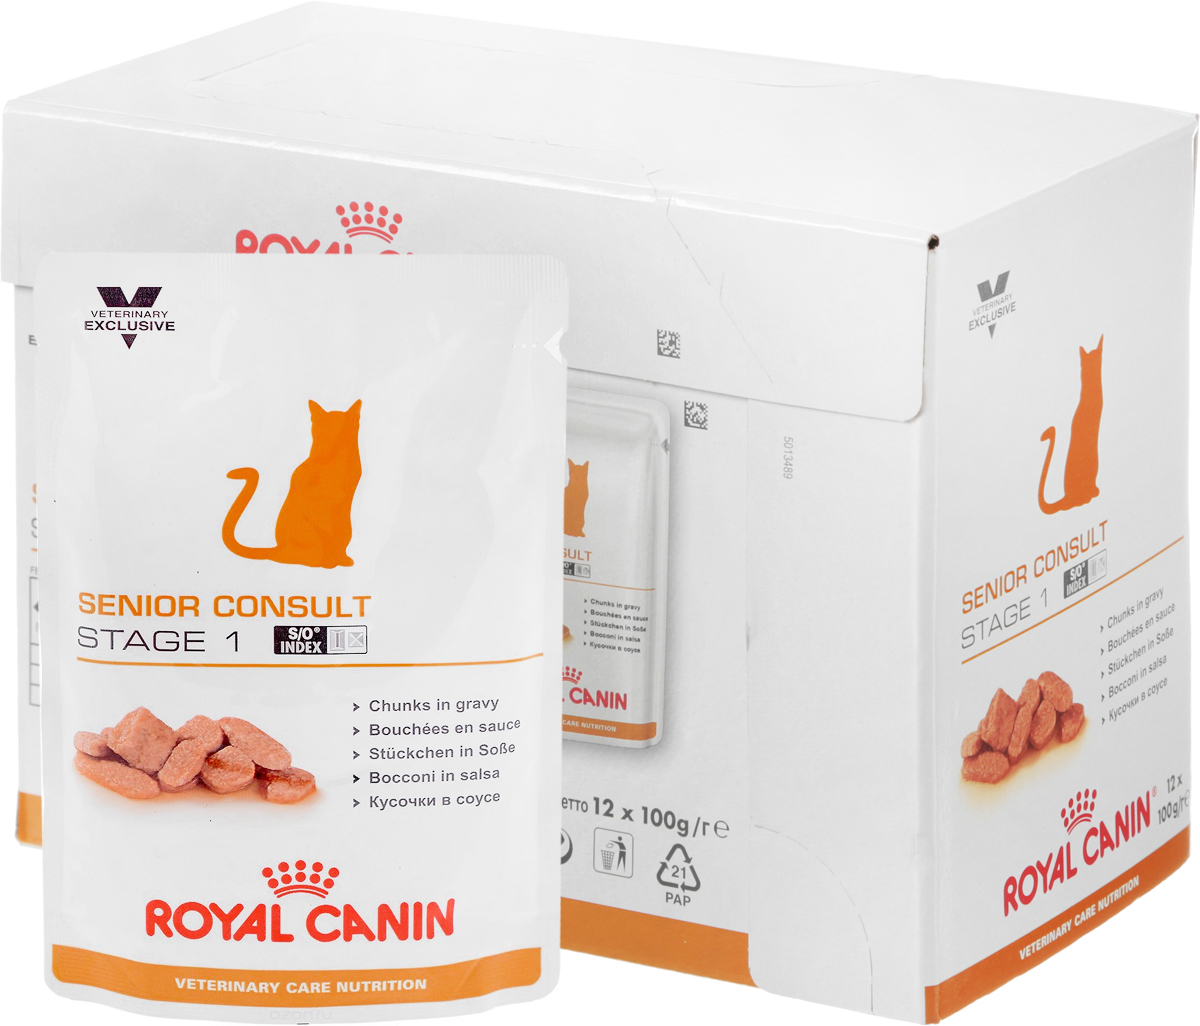 Консервы Royal Canin  Senior Consult Stage 1  для кошек старше 7 лет, 100 г, 12 шт - Корма и лакомства